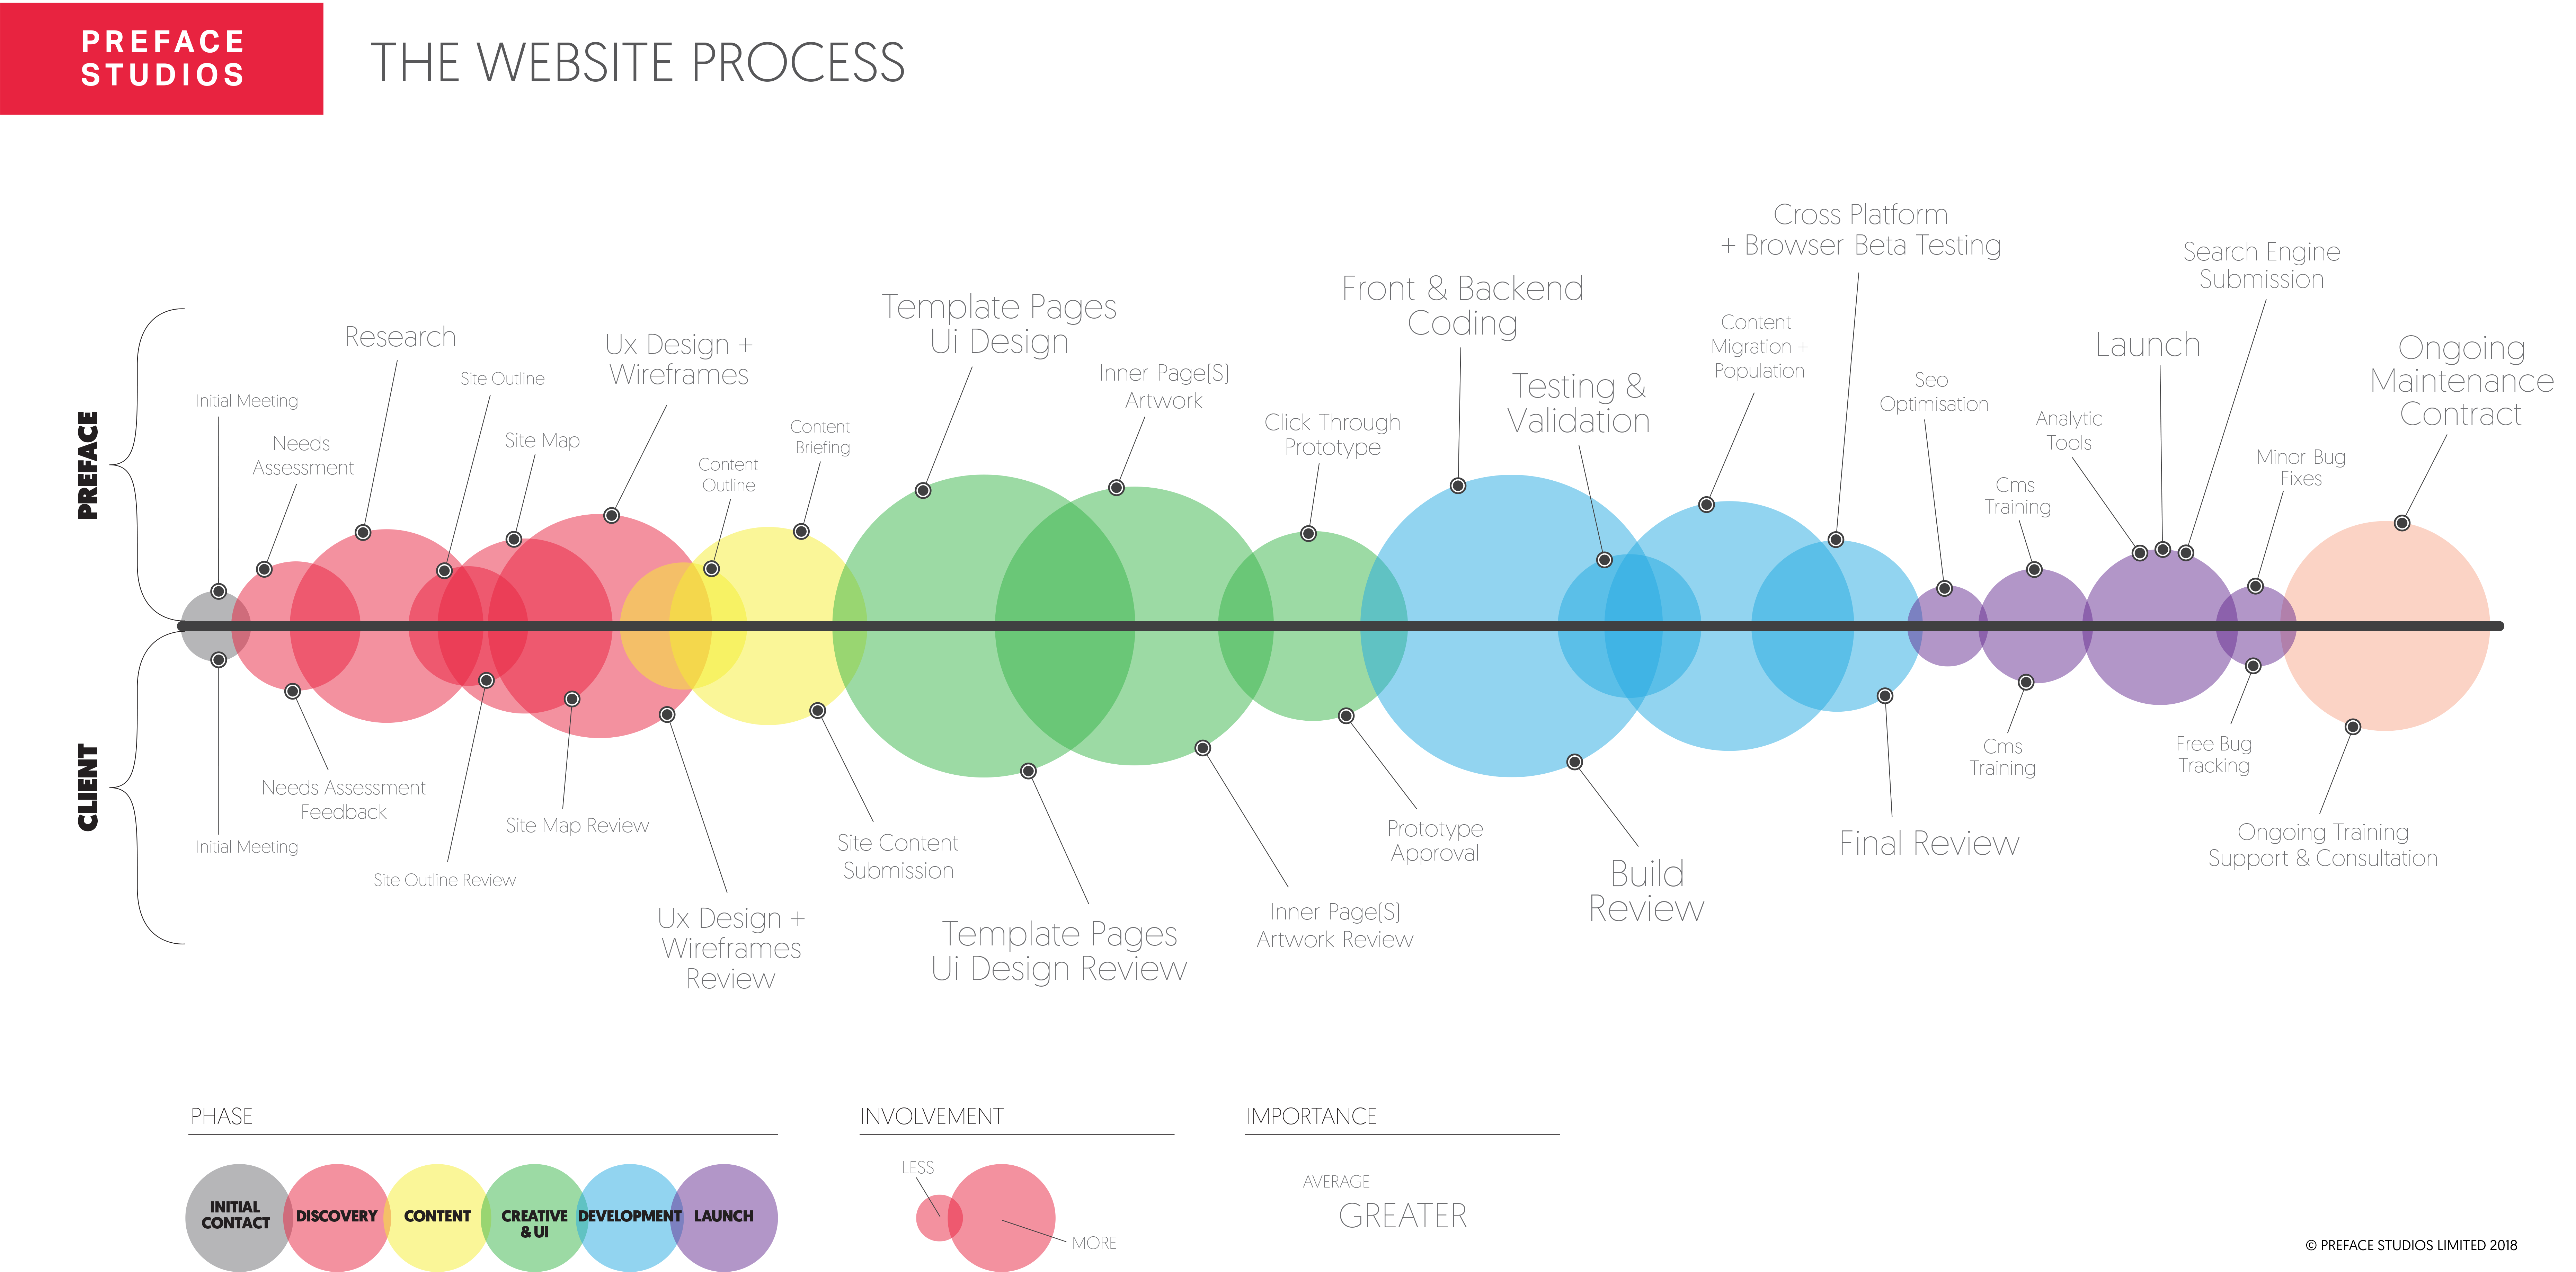 Process Flow Diagram For Website Development Expert Schematics Our Design Web Surrey Preface Studios In Access